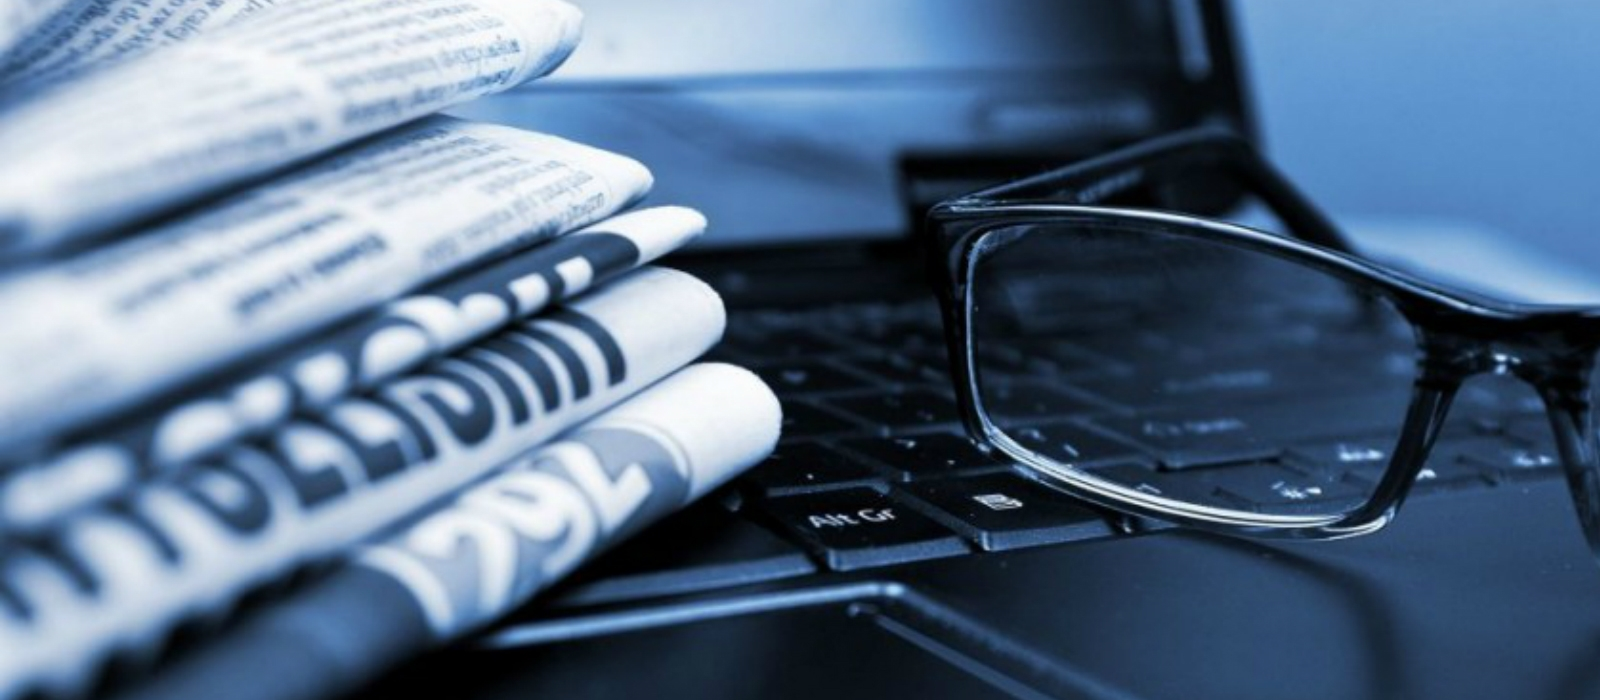 press releases archives axia capital markets llc